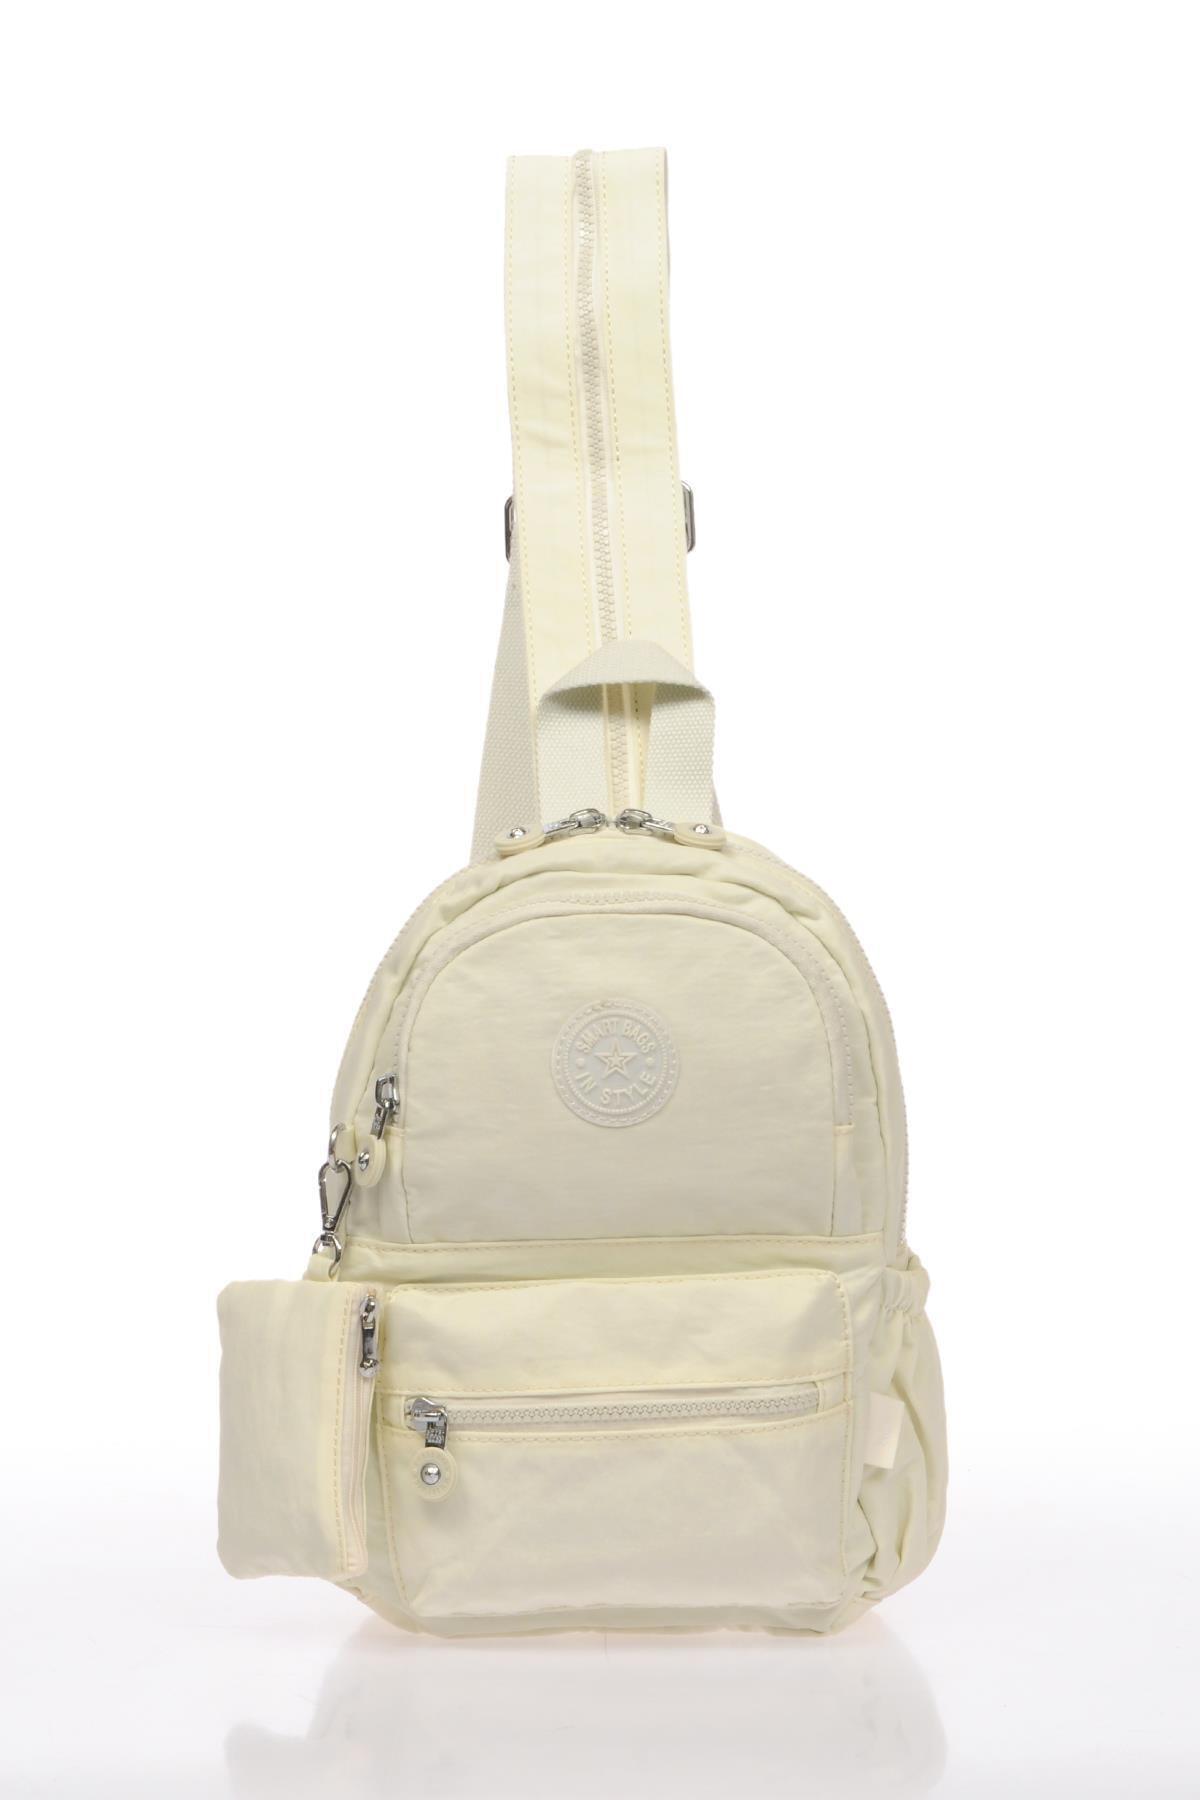 SMART BAGS Smb1030-0002 Beyaz Kadın Küçük Sırt Çantası 1